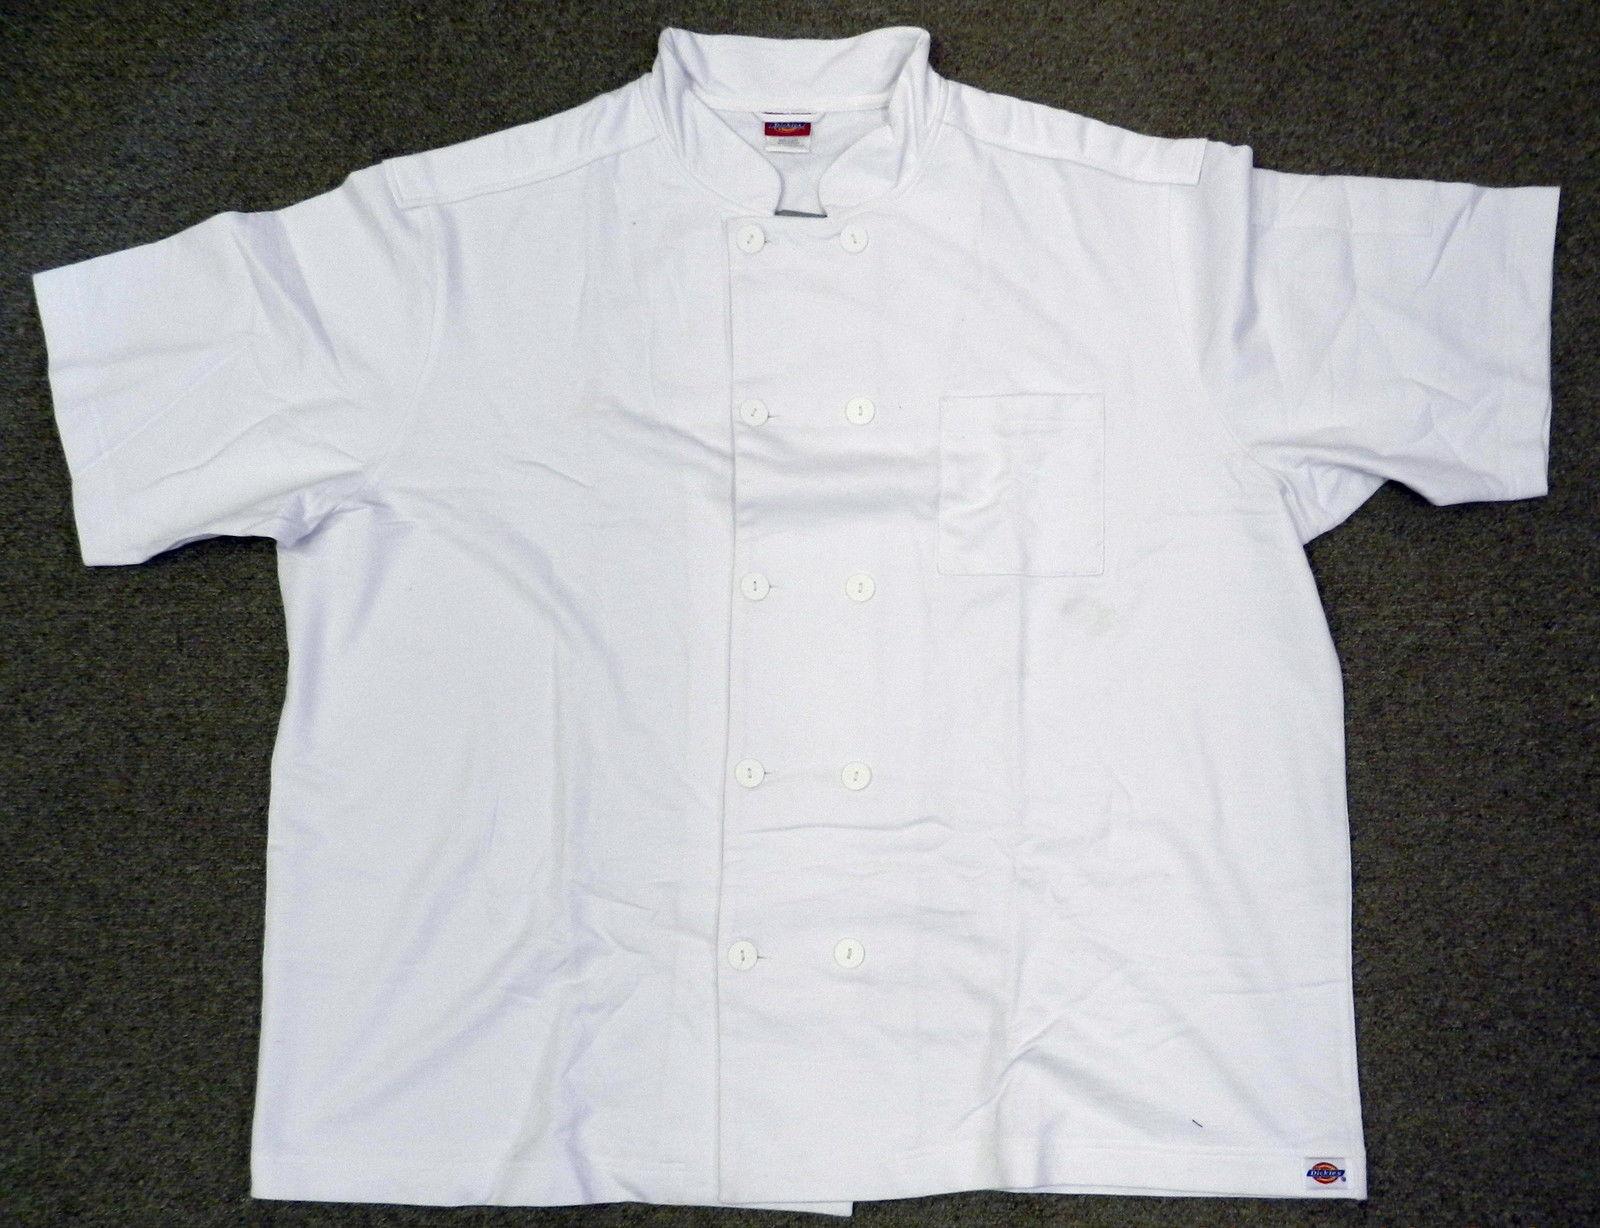 Dickies Jersey Unisex White Restaurant Uniform Chef S/S Coat Jacket S New - $19.57